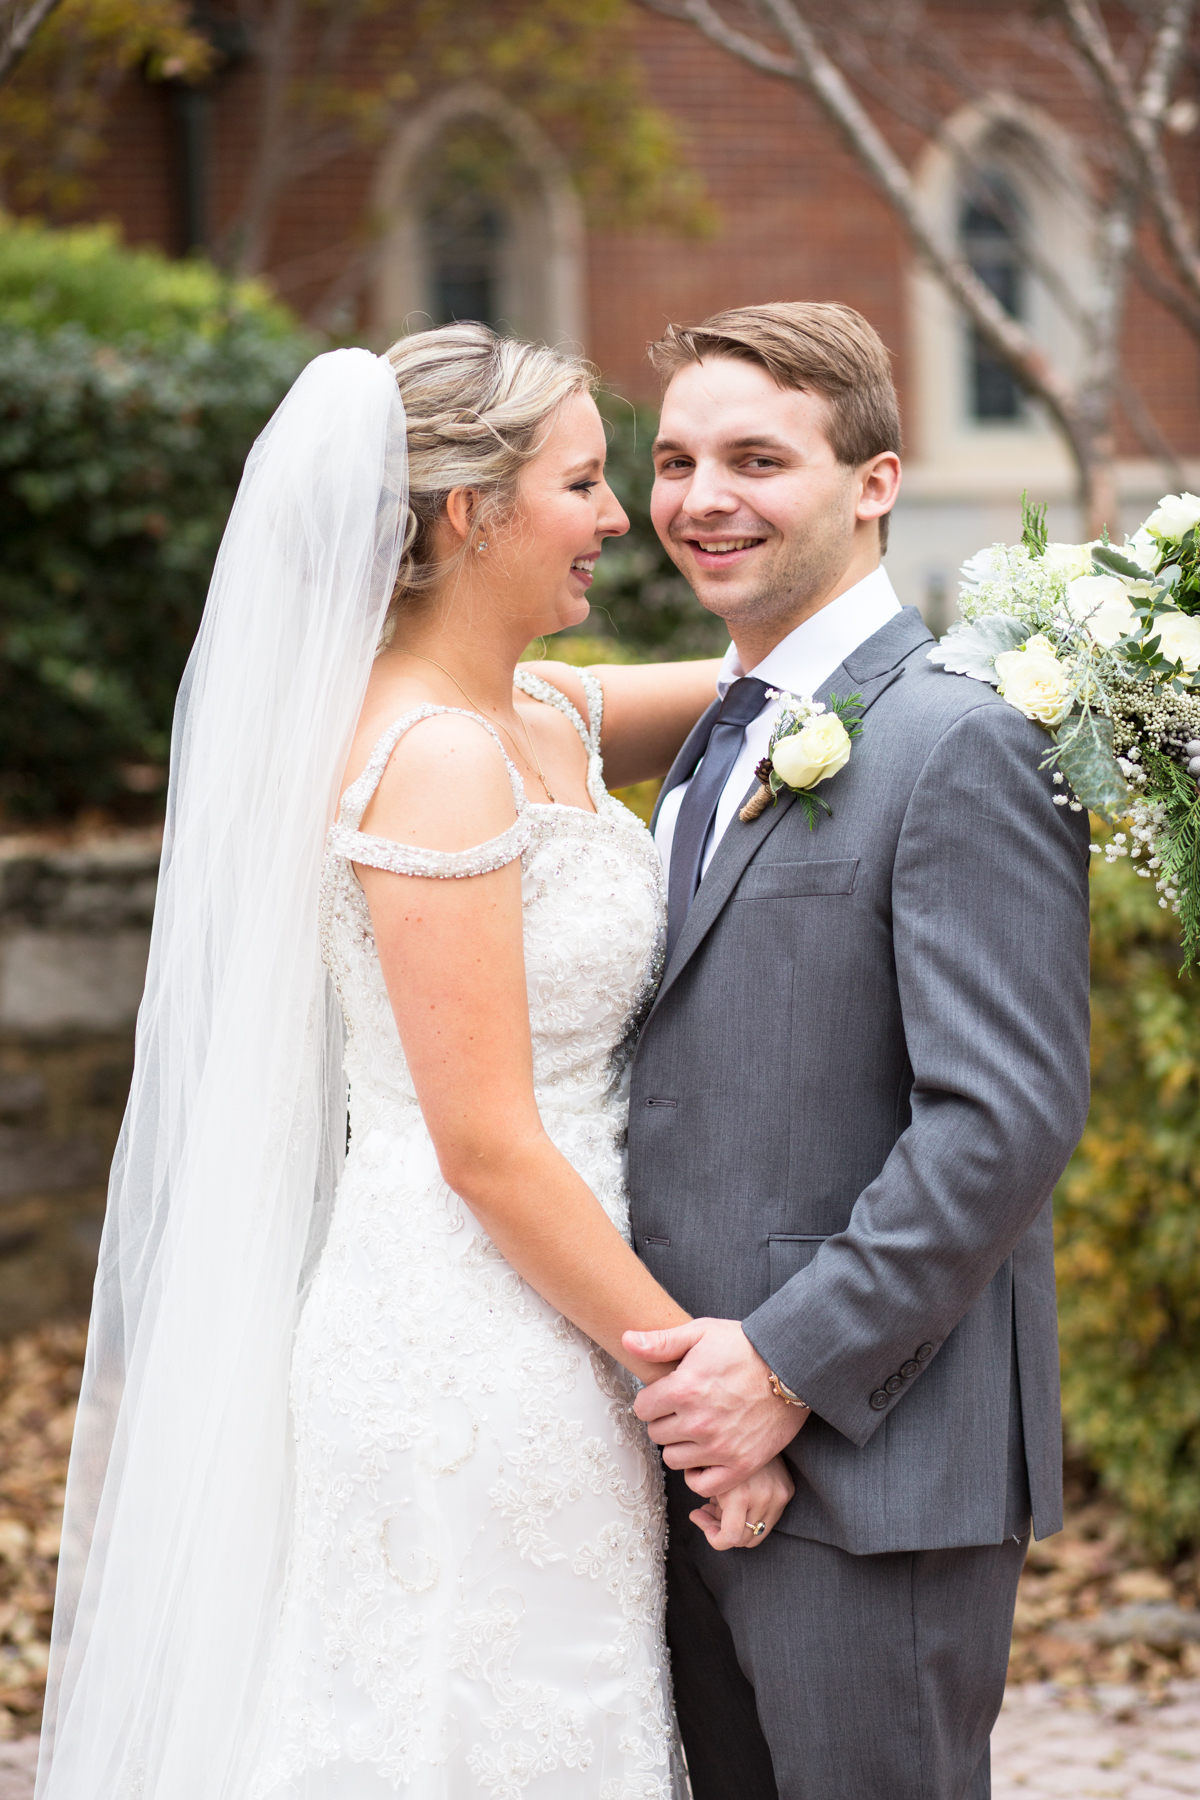 Kelli-and-Matt-Nashville-Wedding-Sneak-Peak-0134.jpg